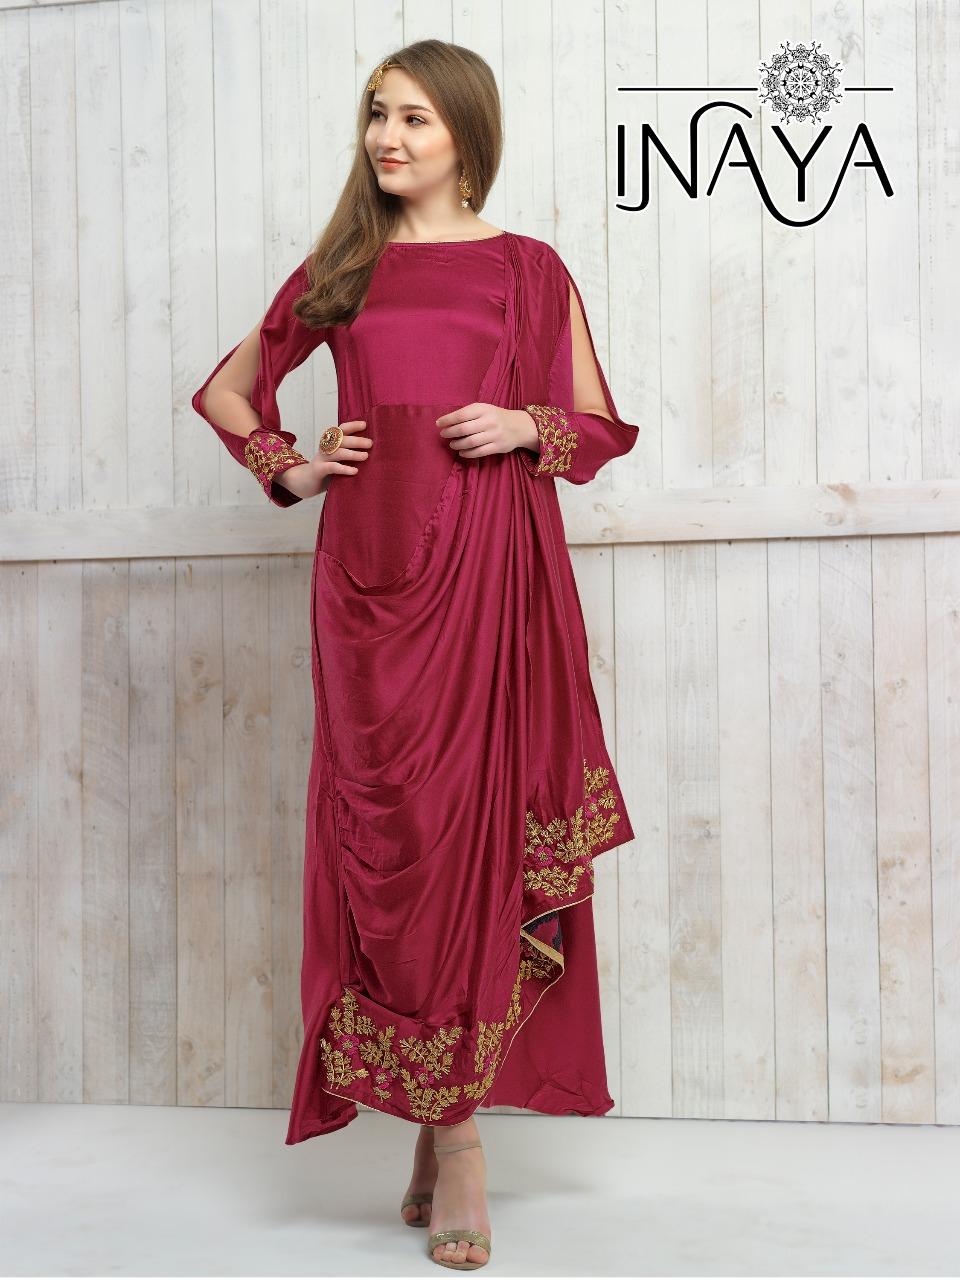 Inaya by studio libas saree pallu designer Stylish concept Saree concept